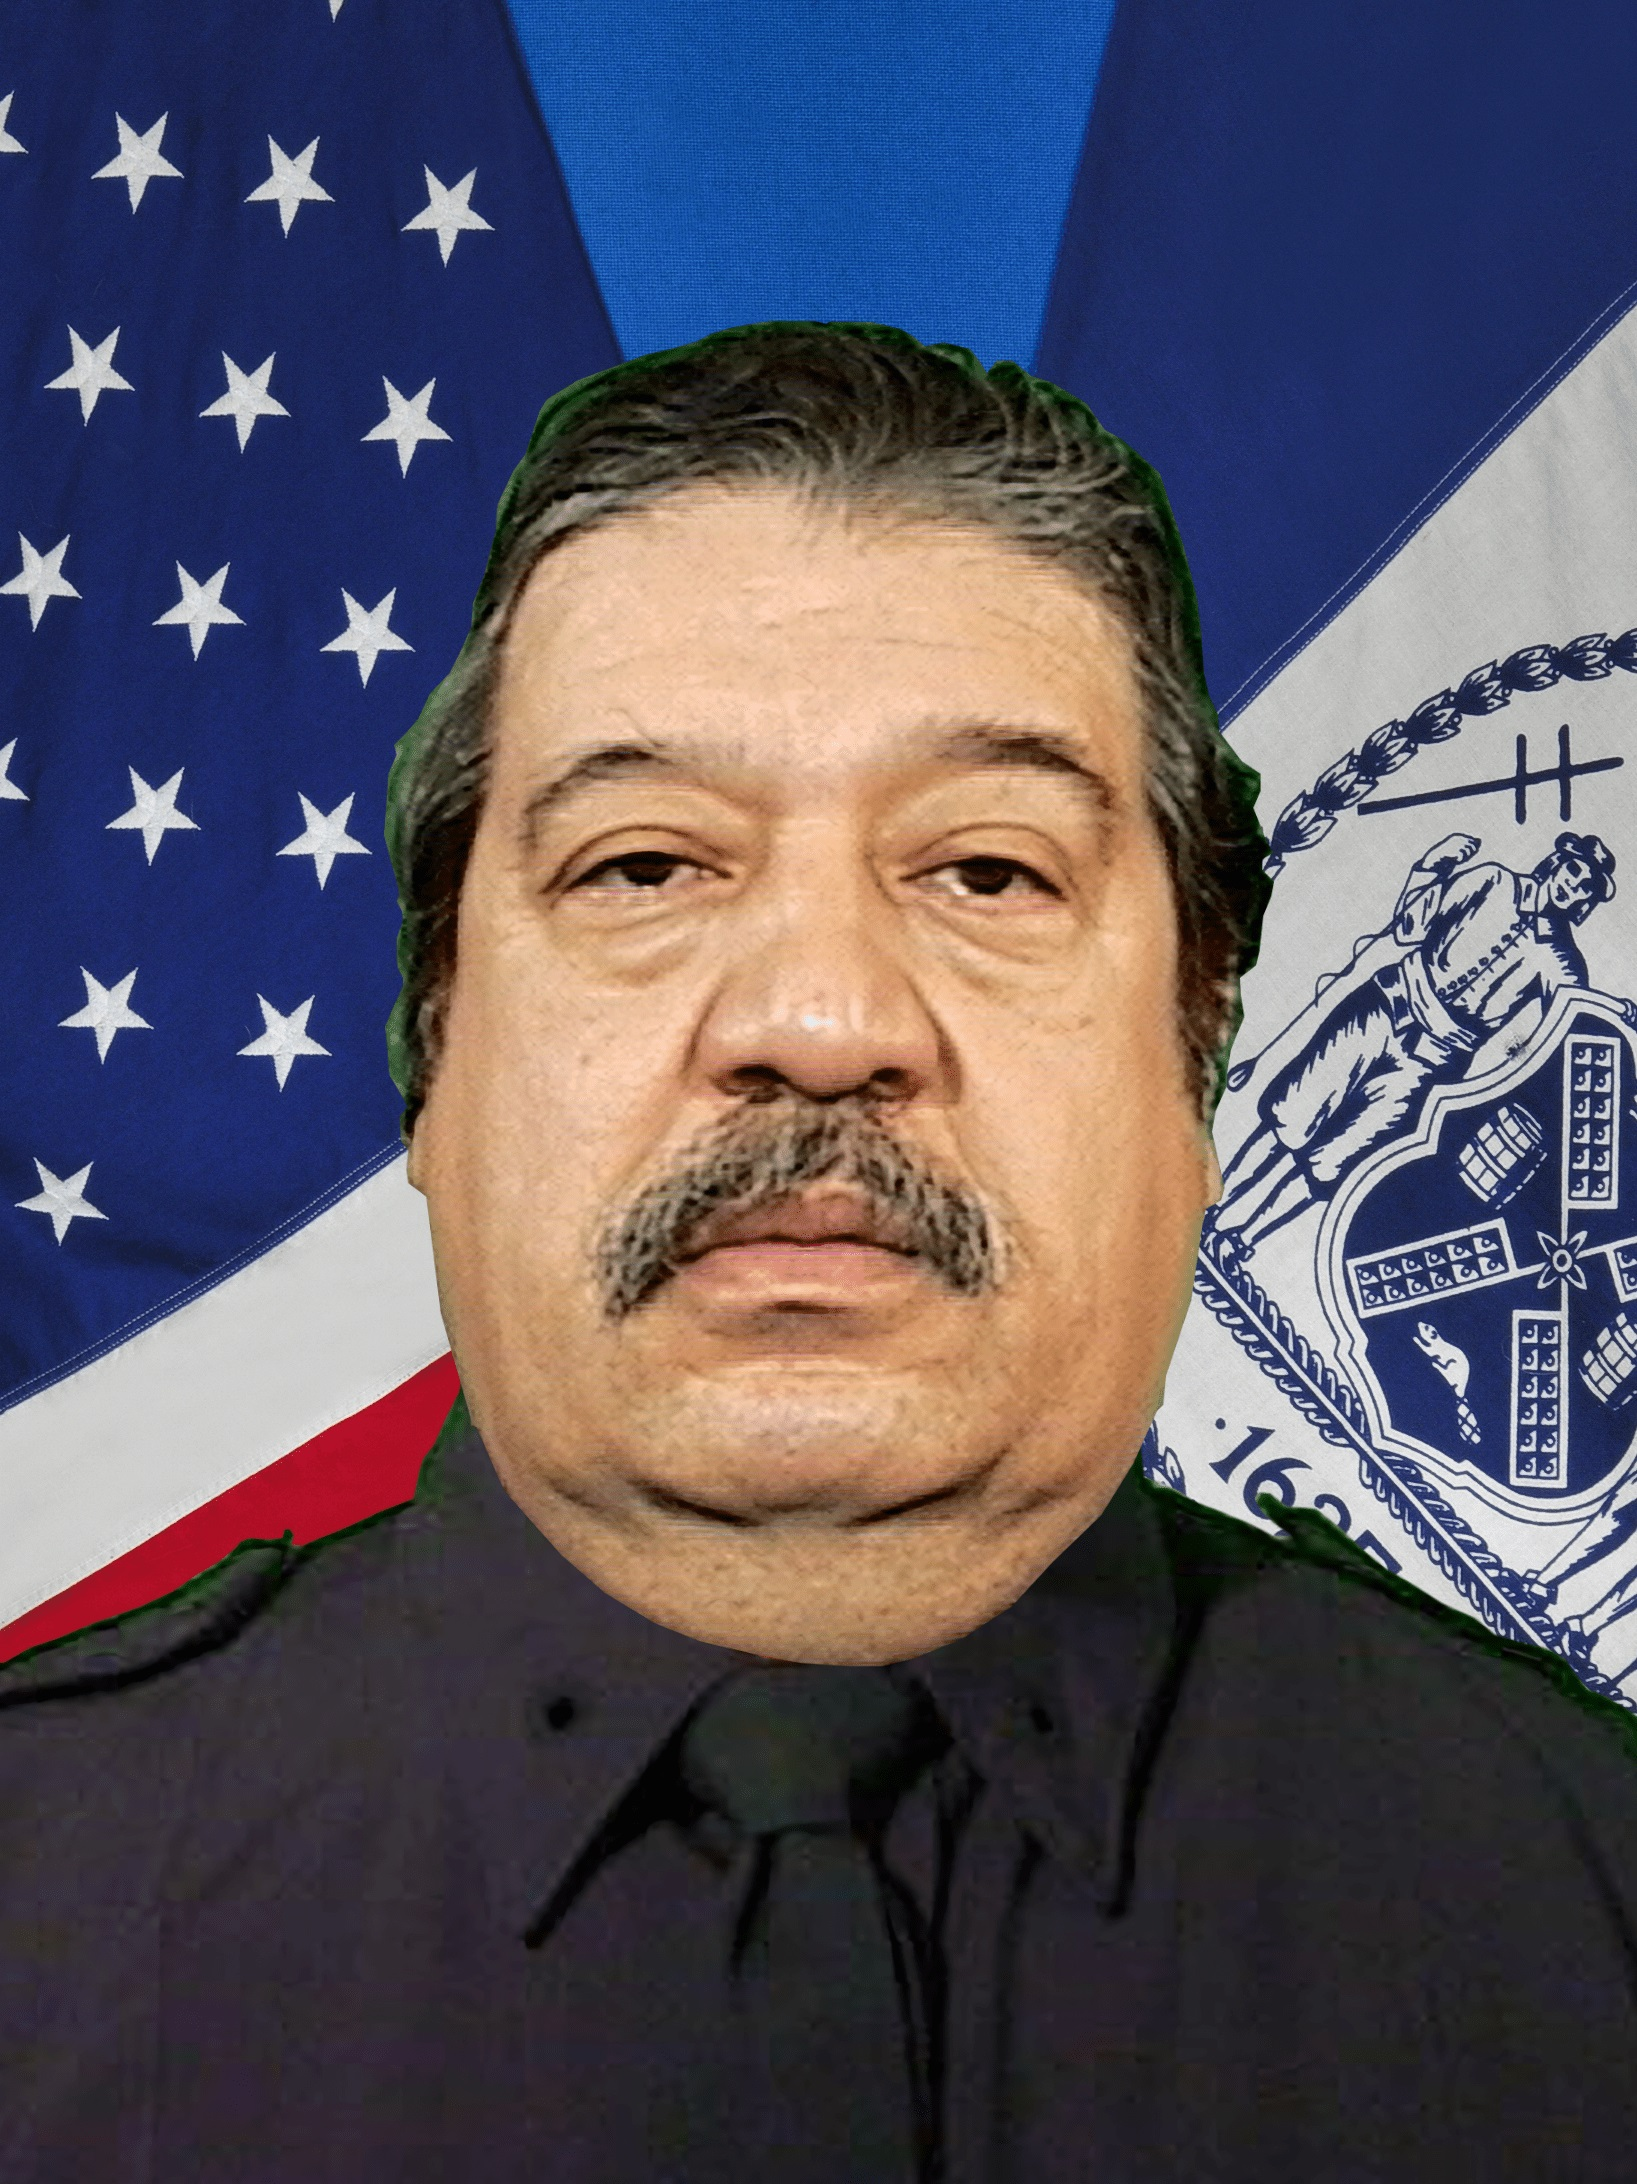 Police Officer Robert Ortiz | New York City Police Department, New York